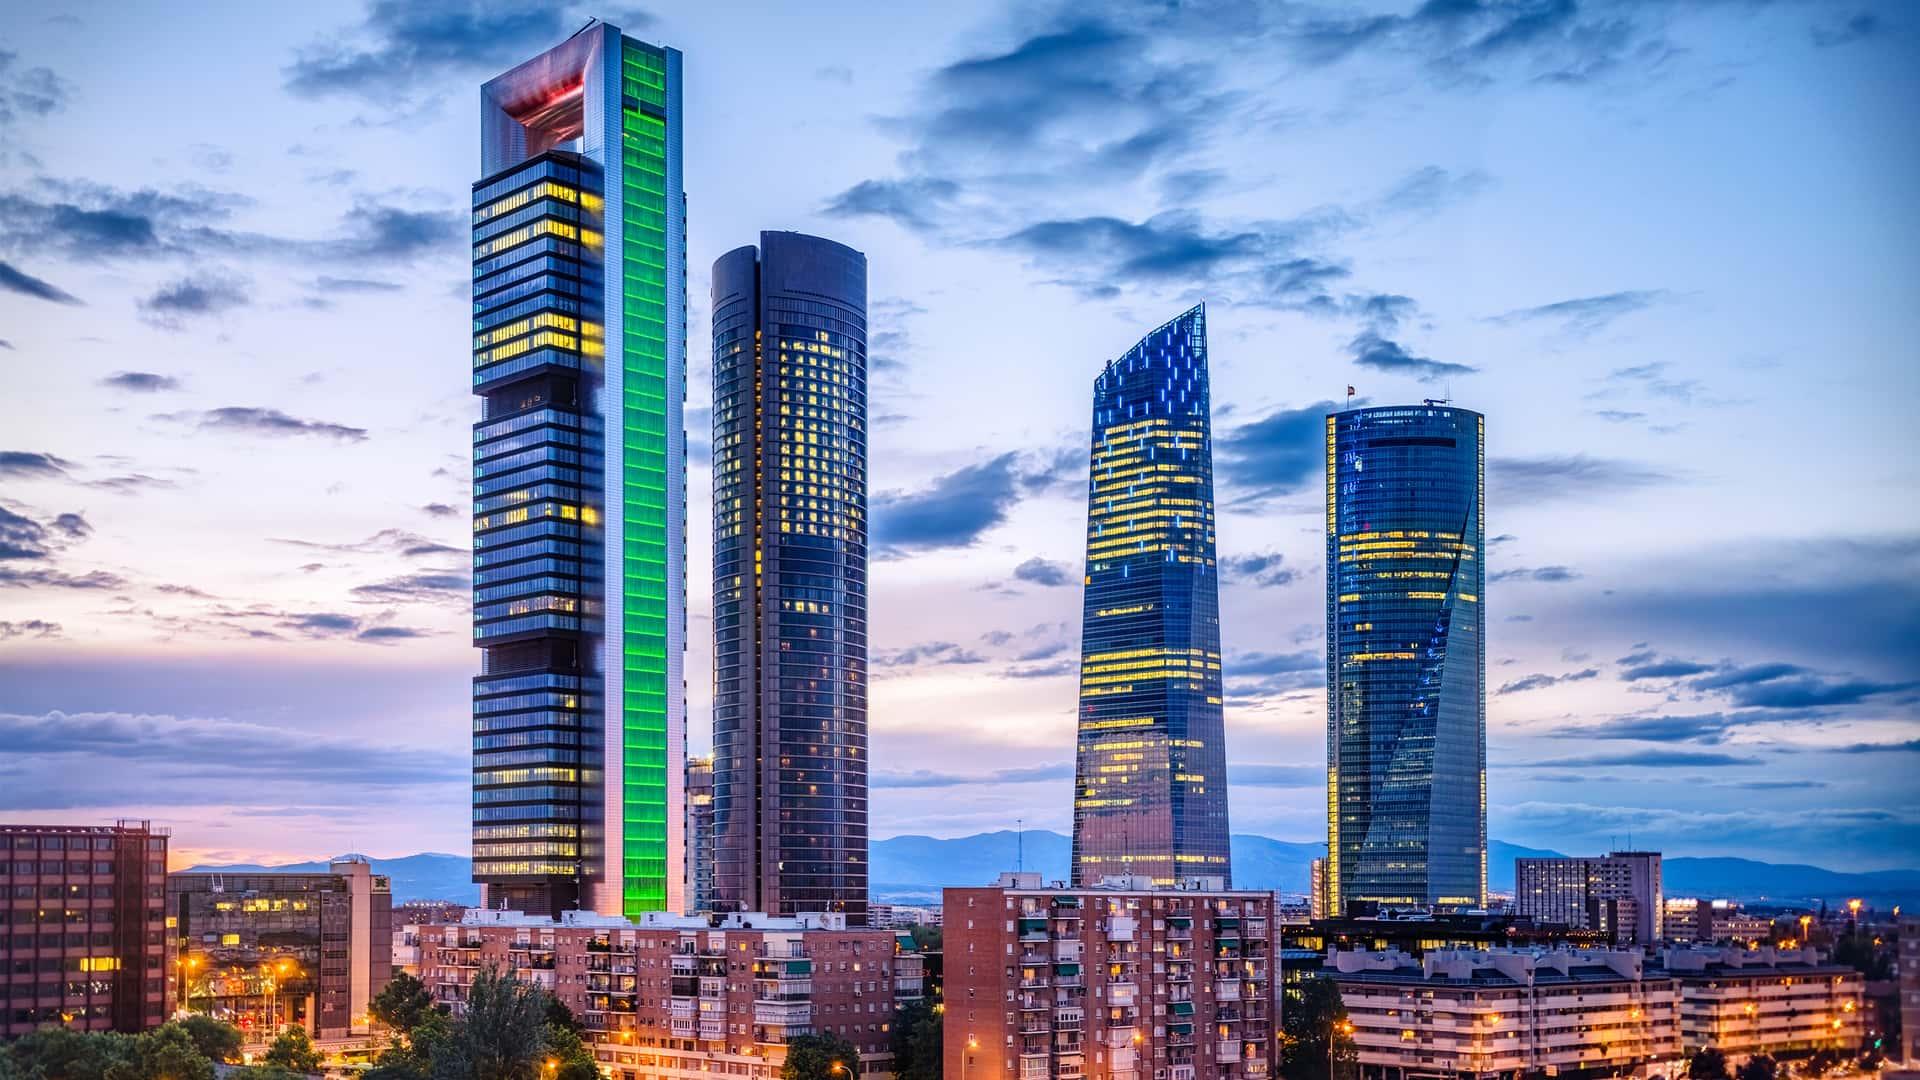 Disfruta de Euskaltel en Madrid sin límites